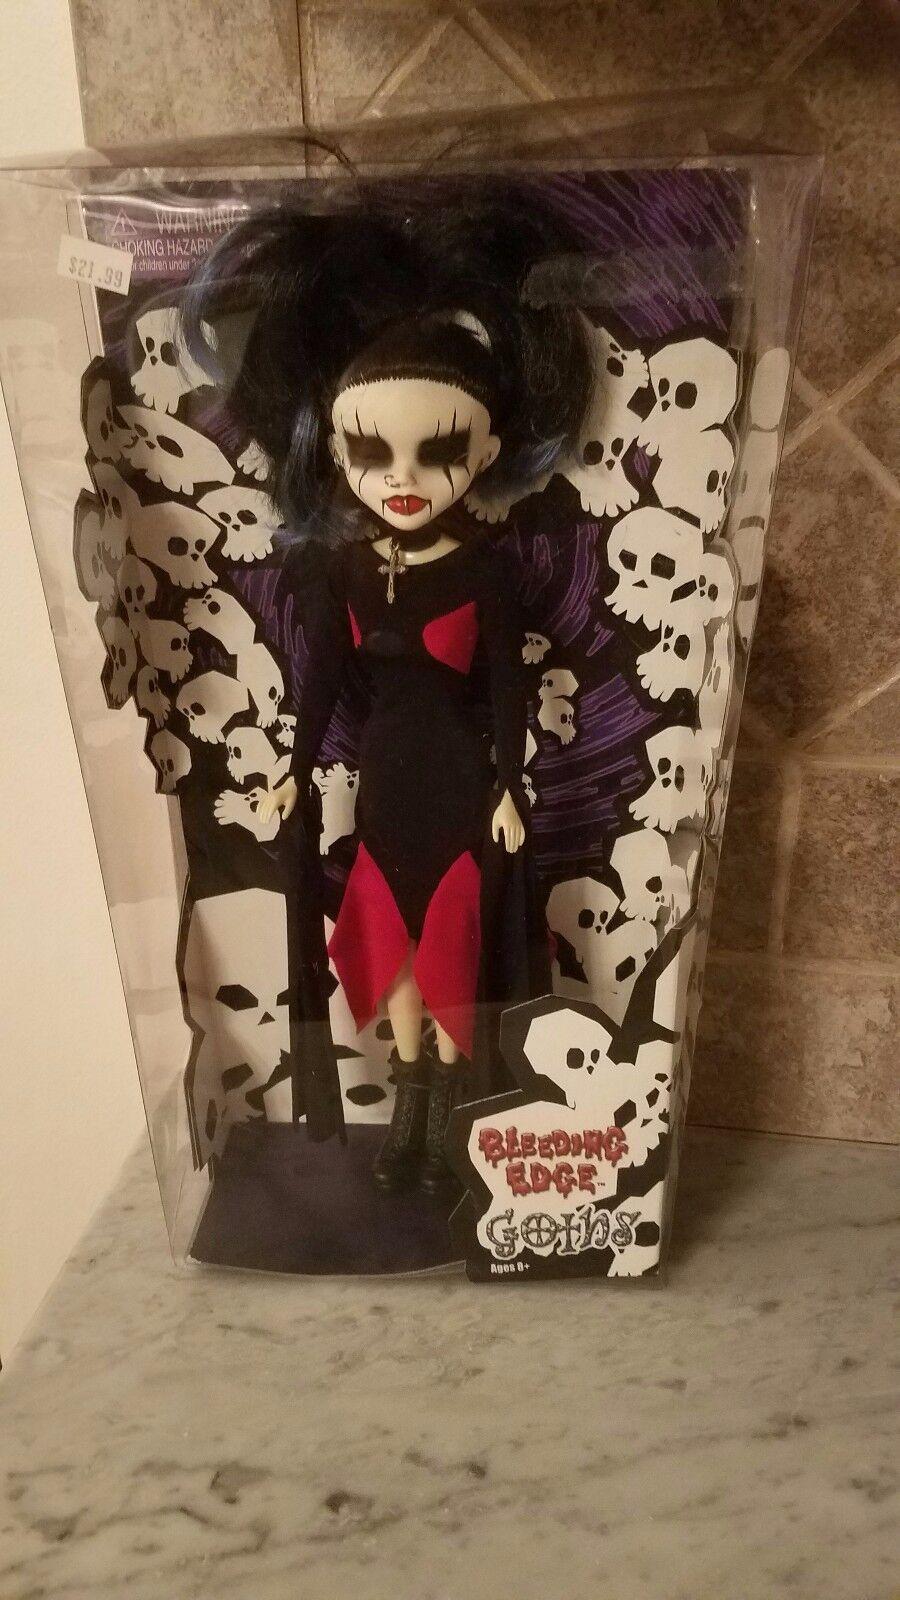 Bleeding Edge Goths Doll NEW IN BOX  Sinstress  2003